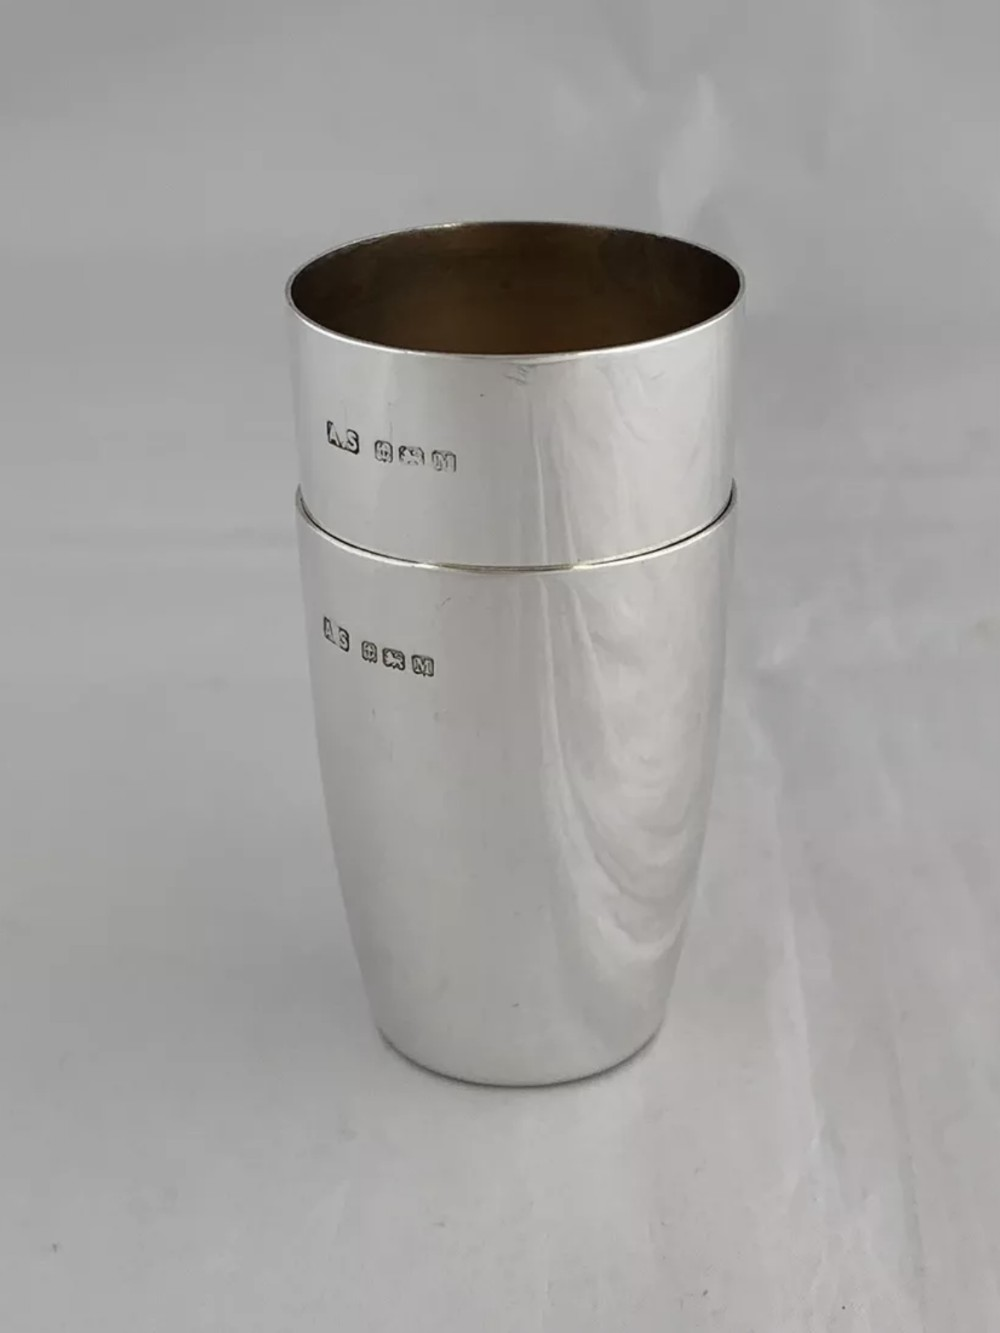 pair of solid sterling silver beakers or stirrup cups 1936 birmingham sterling